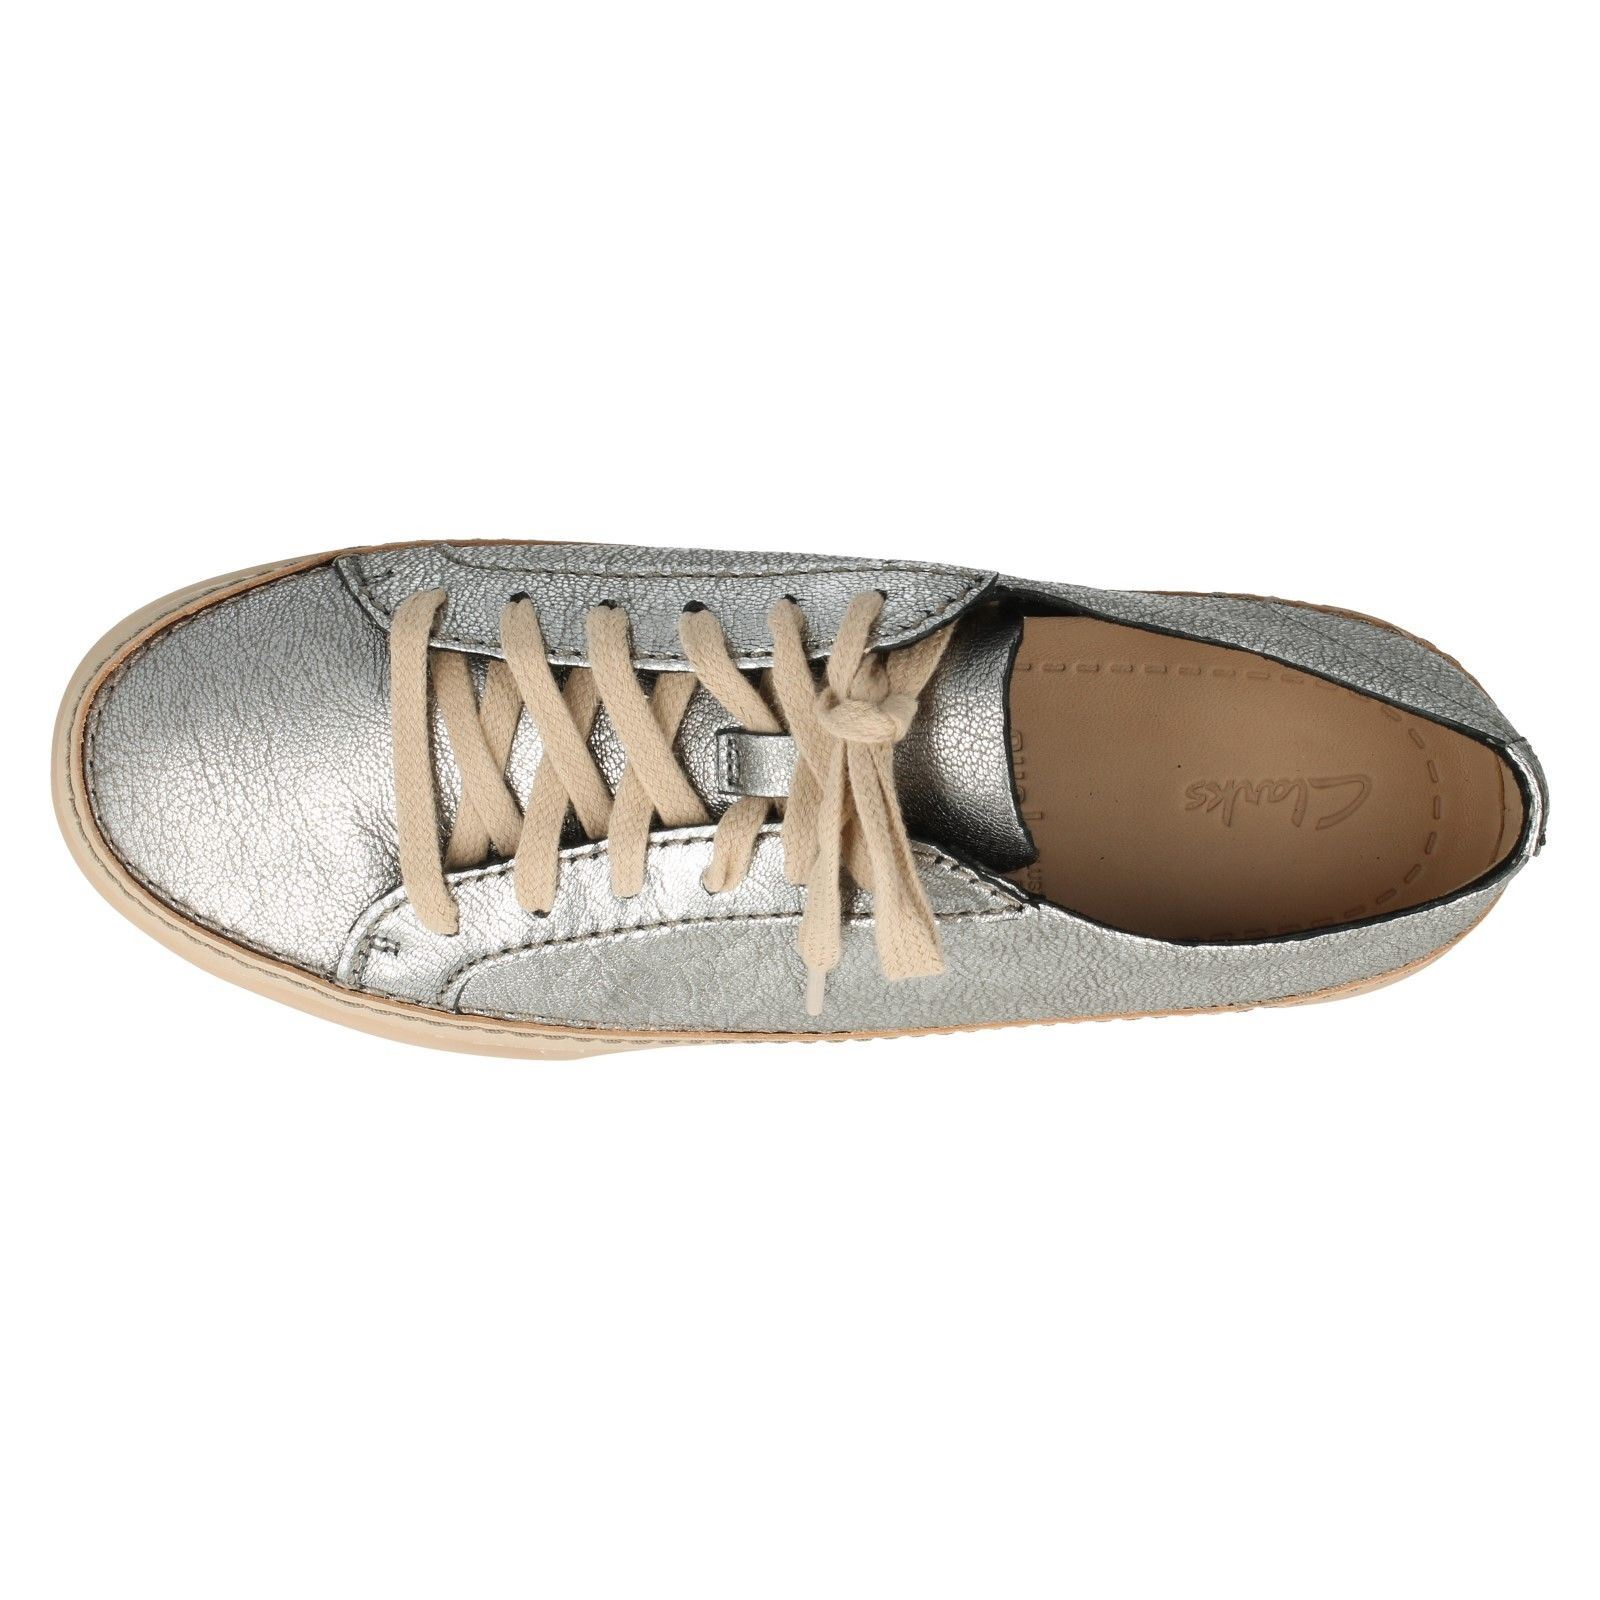 newest collection 63e13 6c010 ... Nike Sb Janoski Mid Gore Gore Gore Tex (size 10) Weatherproof Black  White Blue ...